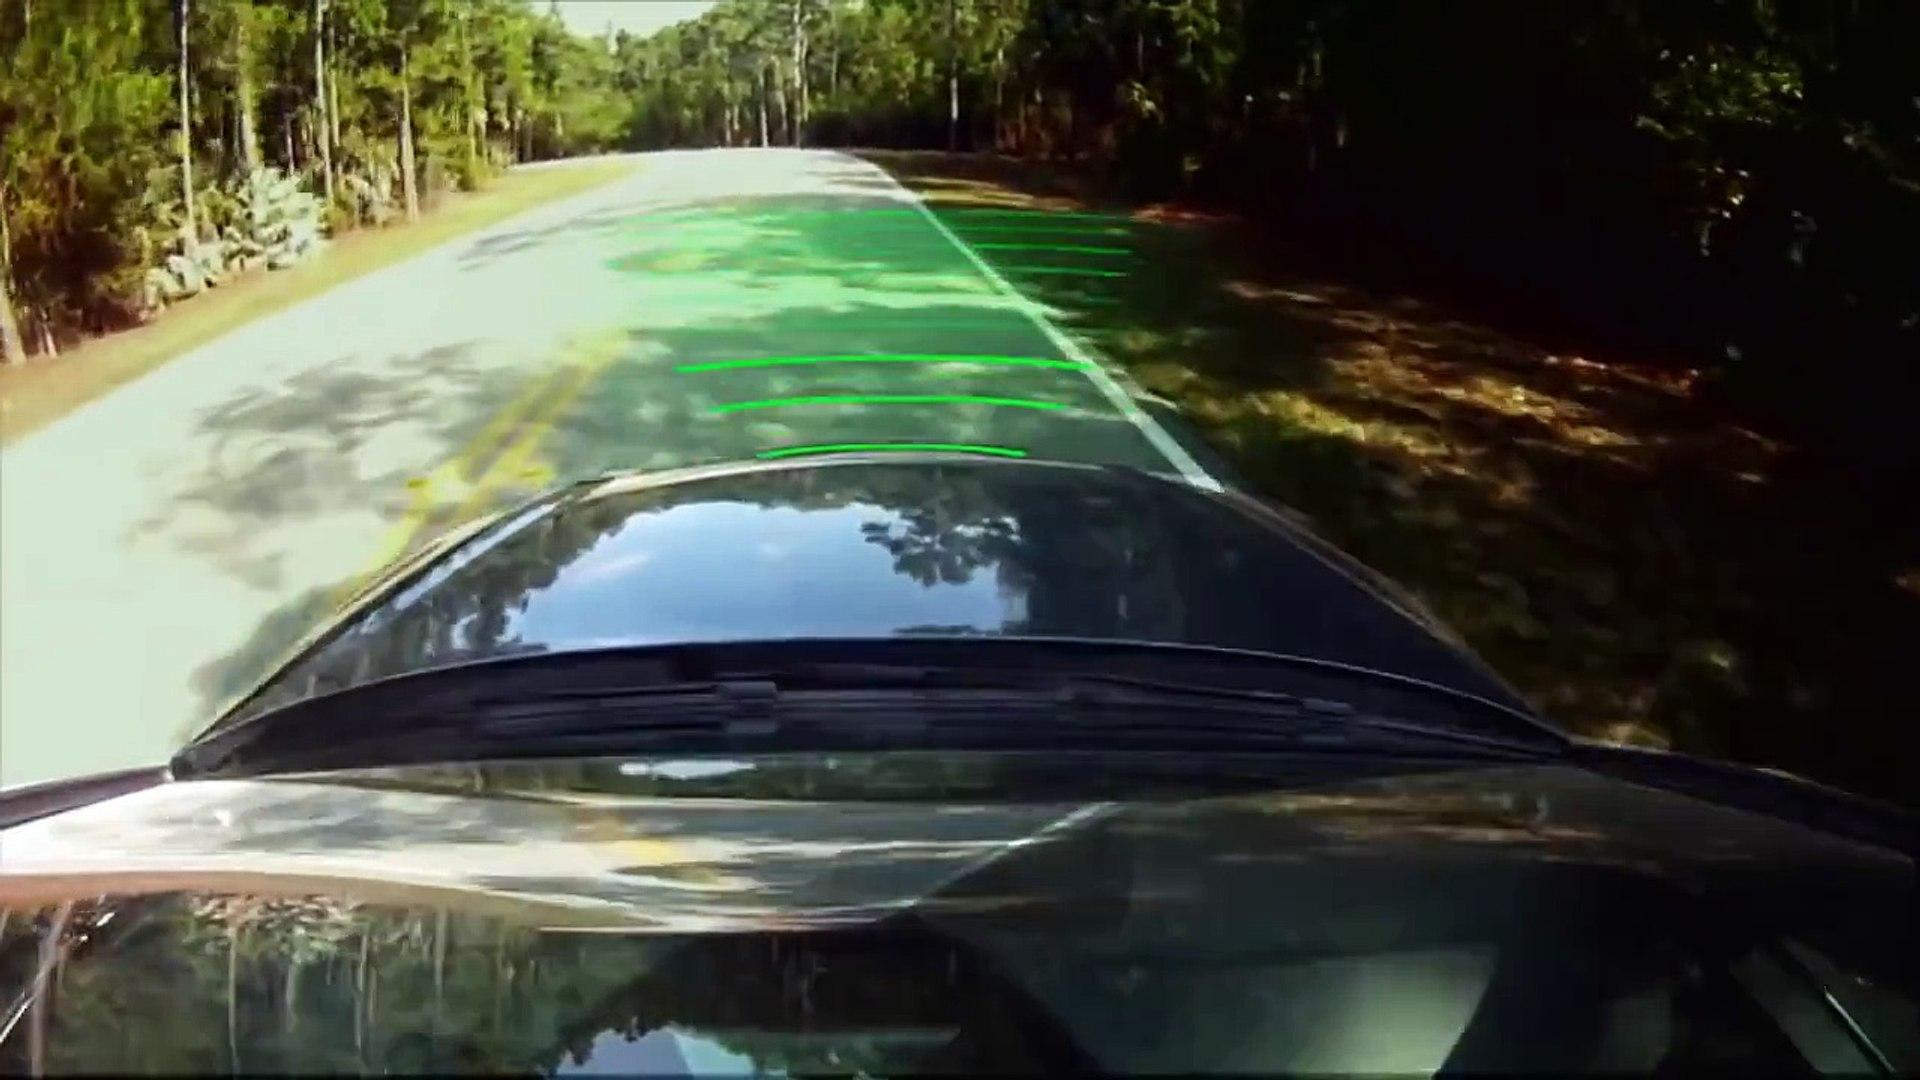 new technology : The latest brake technology cars Audi